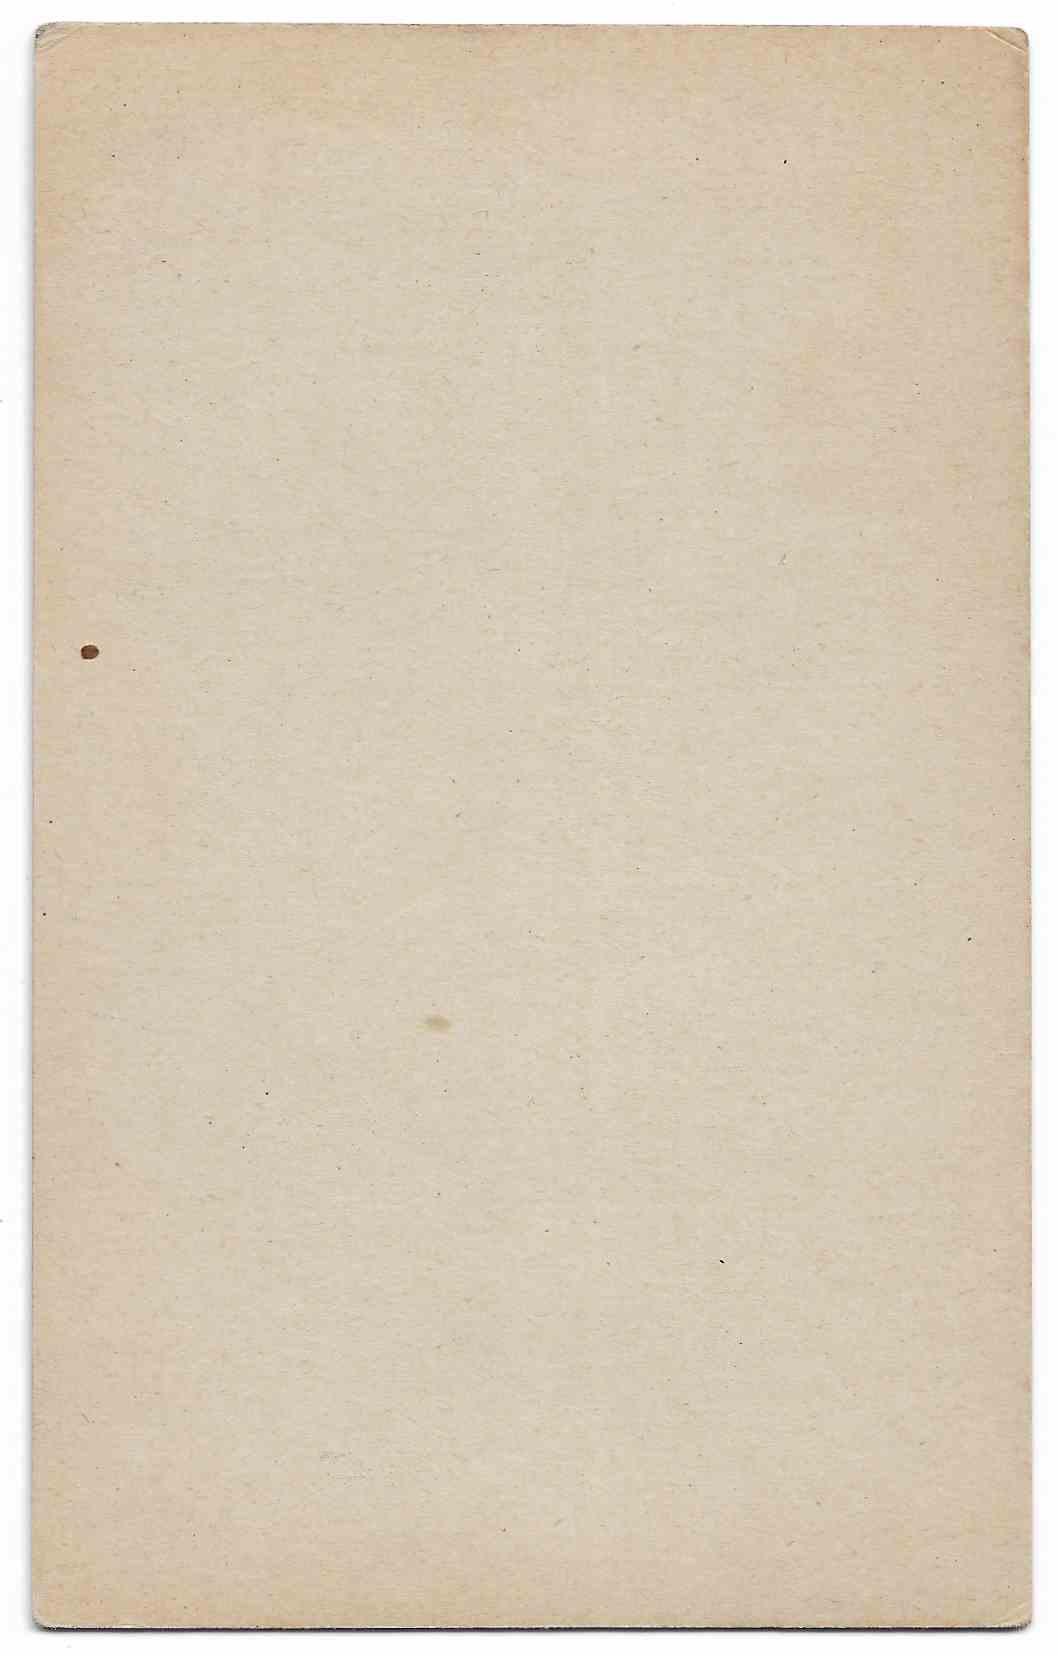 1947 Exhibits George Kell card back image